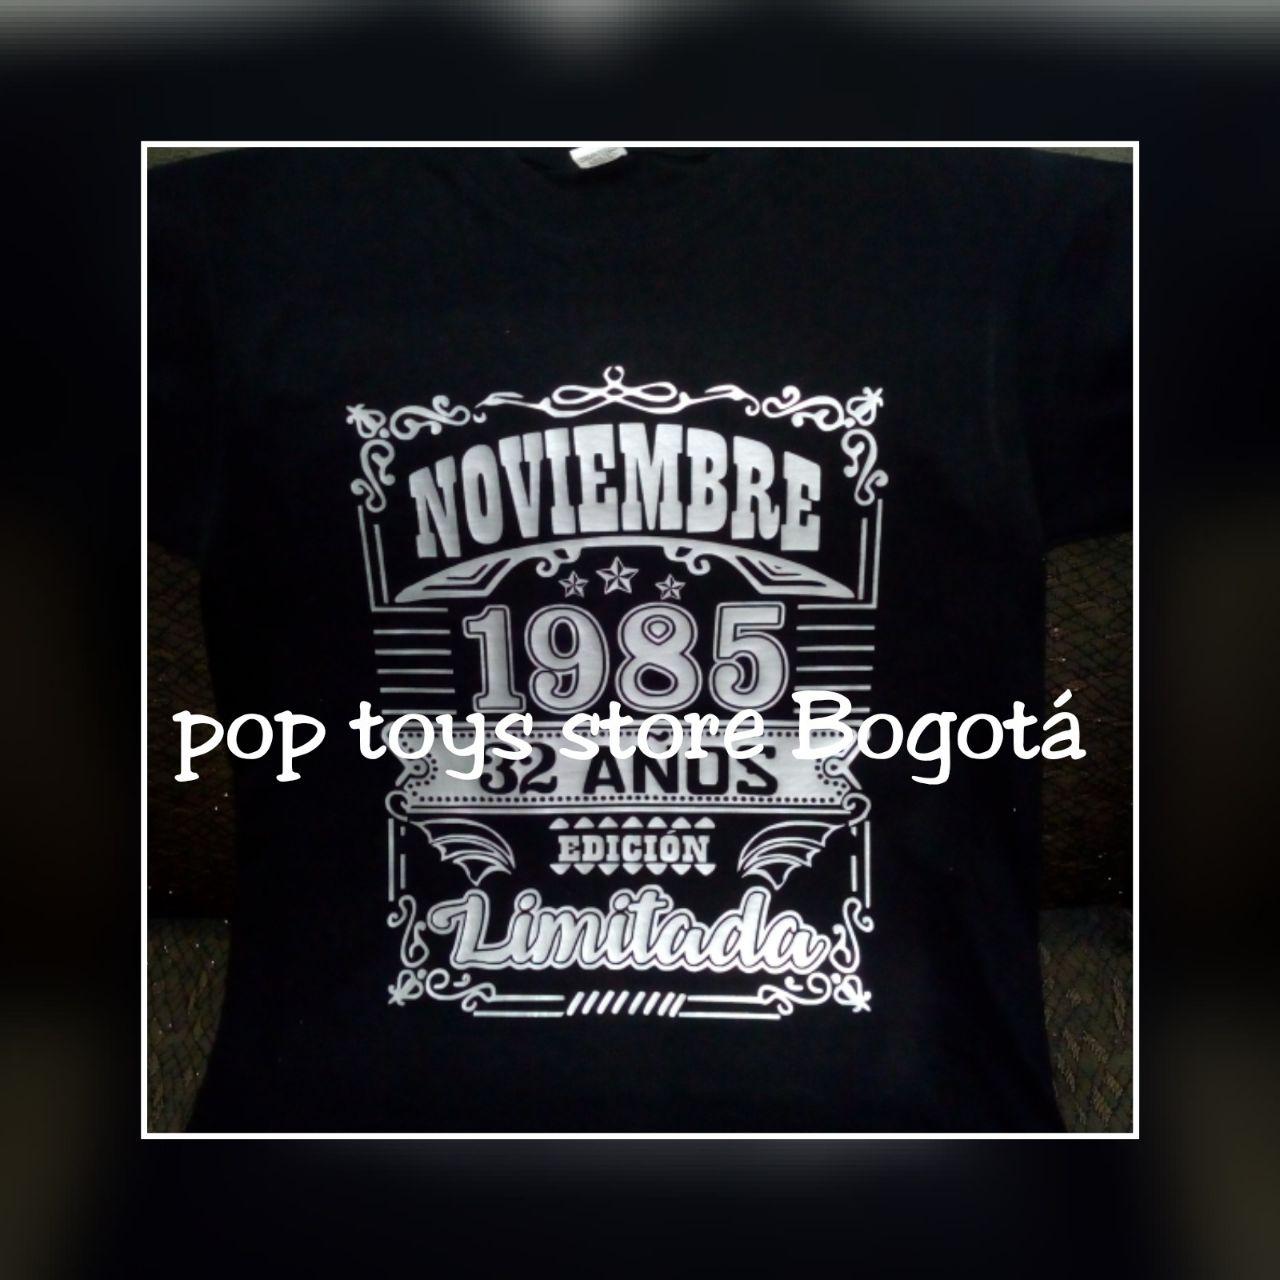 Noviembre 1985